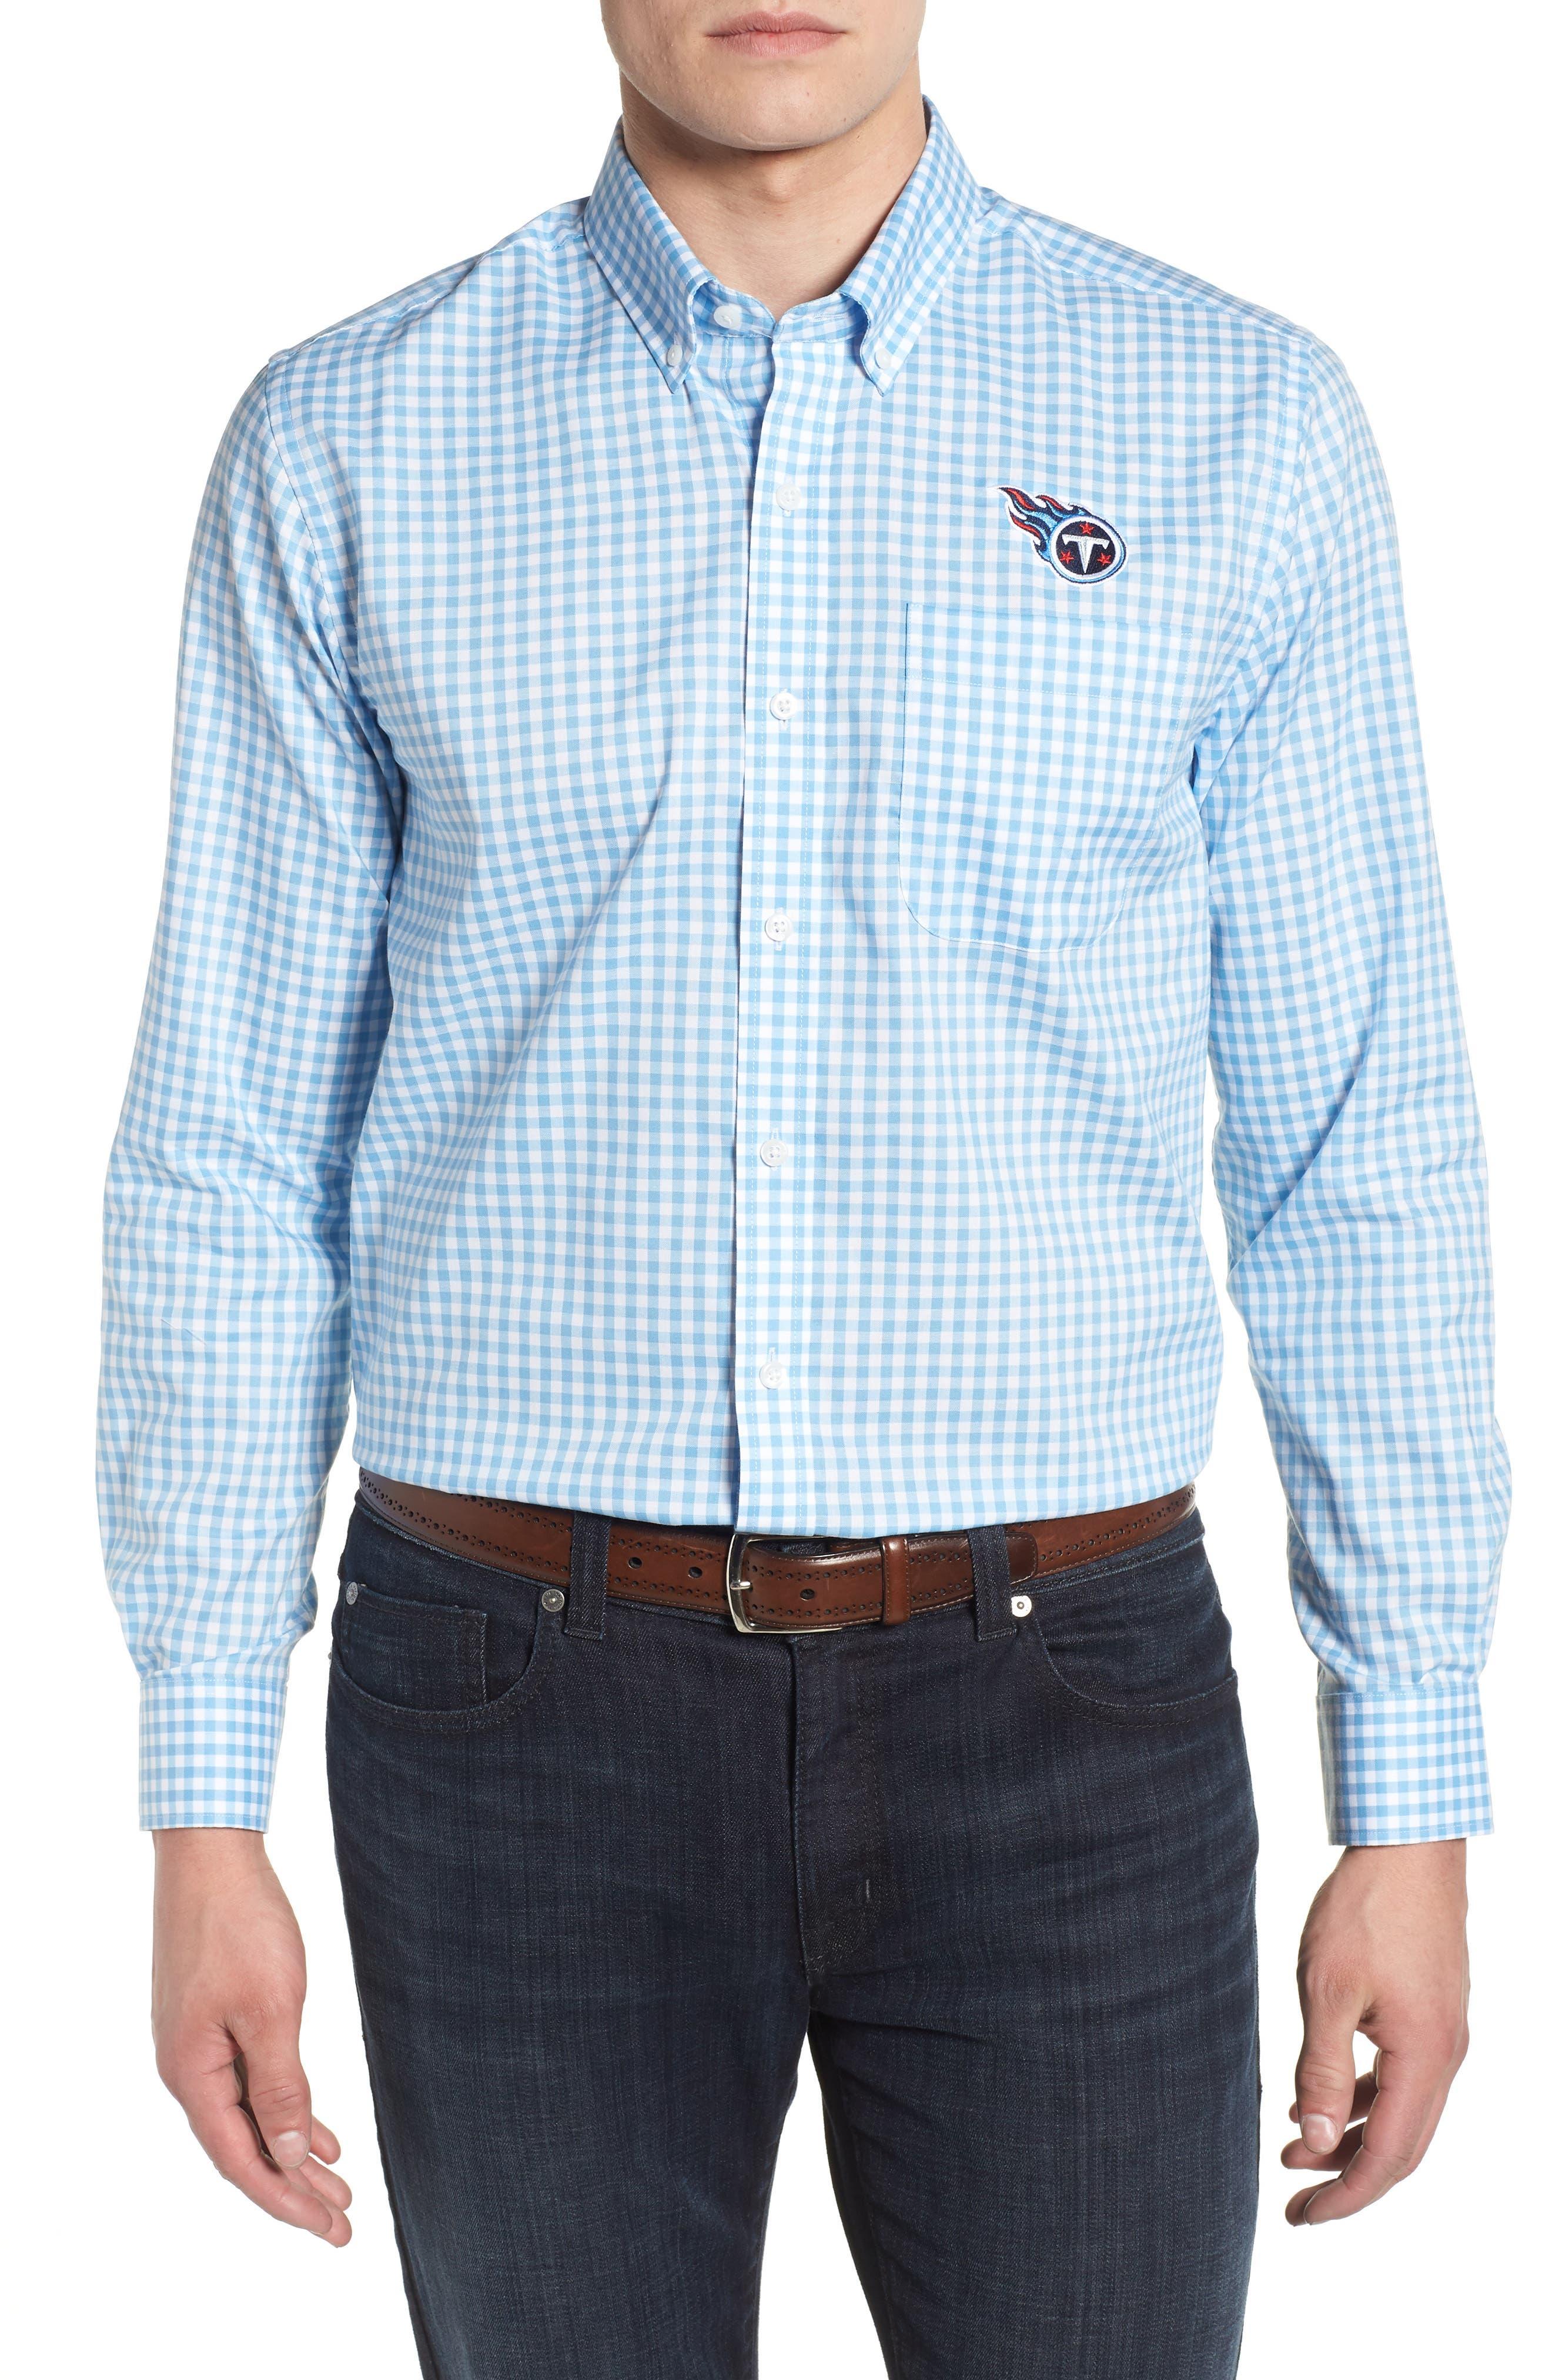 Tennessee Titans - League Regular Fit Sport Shirt,                             Main thumbnail 1, color,                             ATLAS